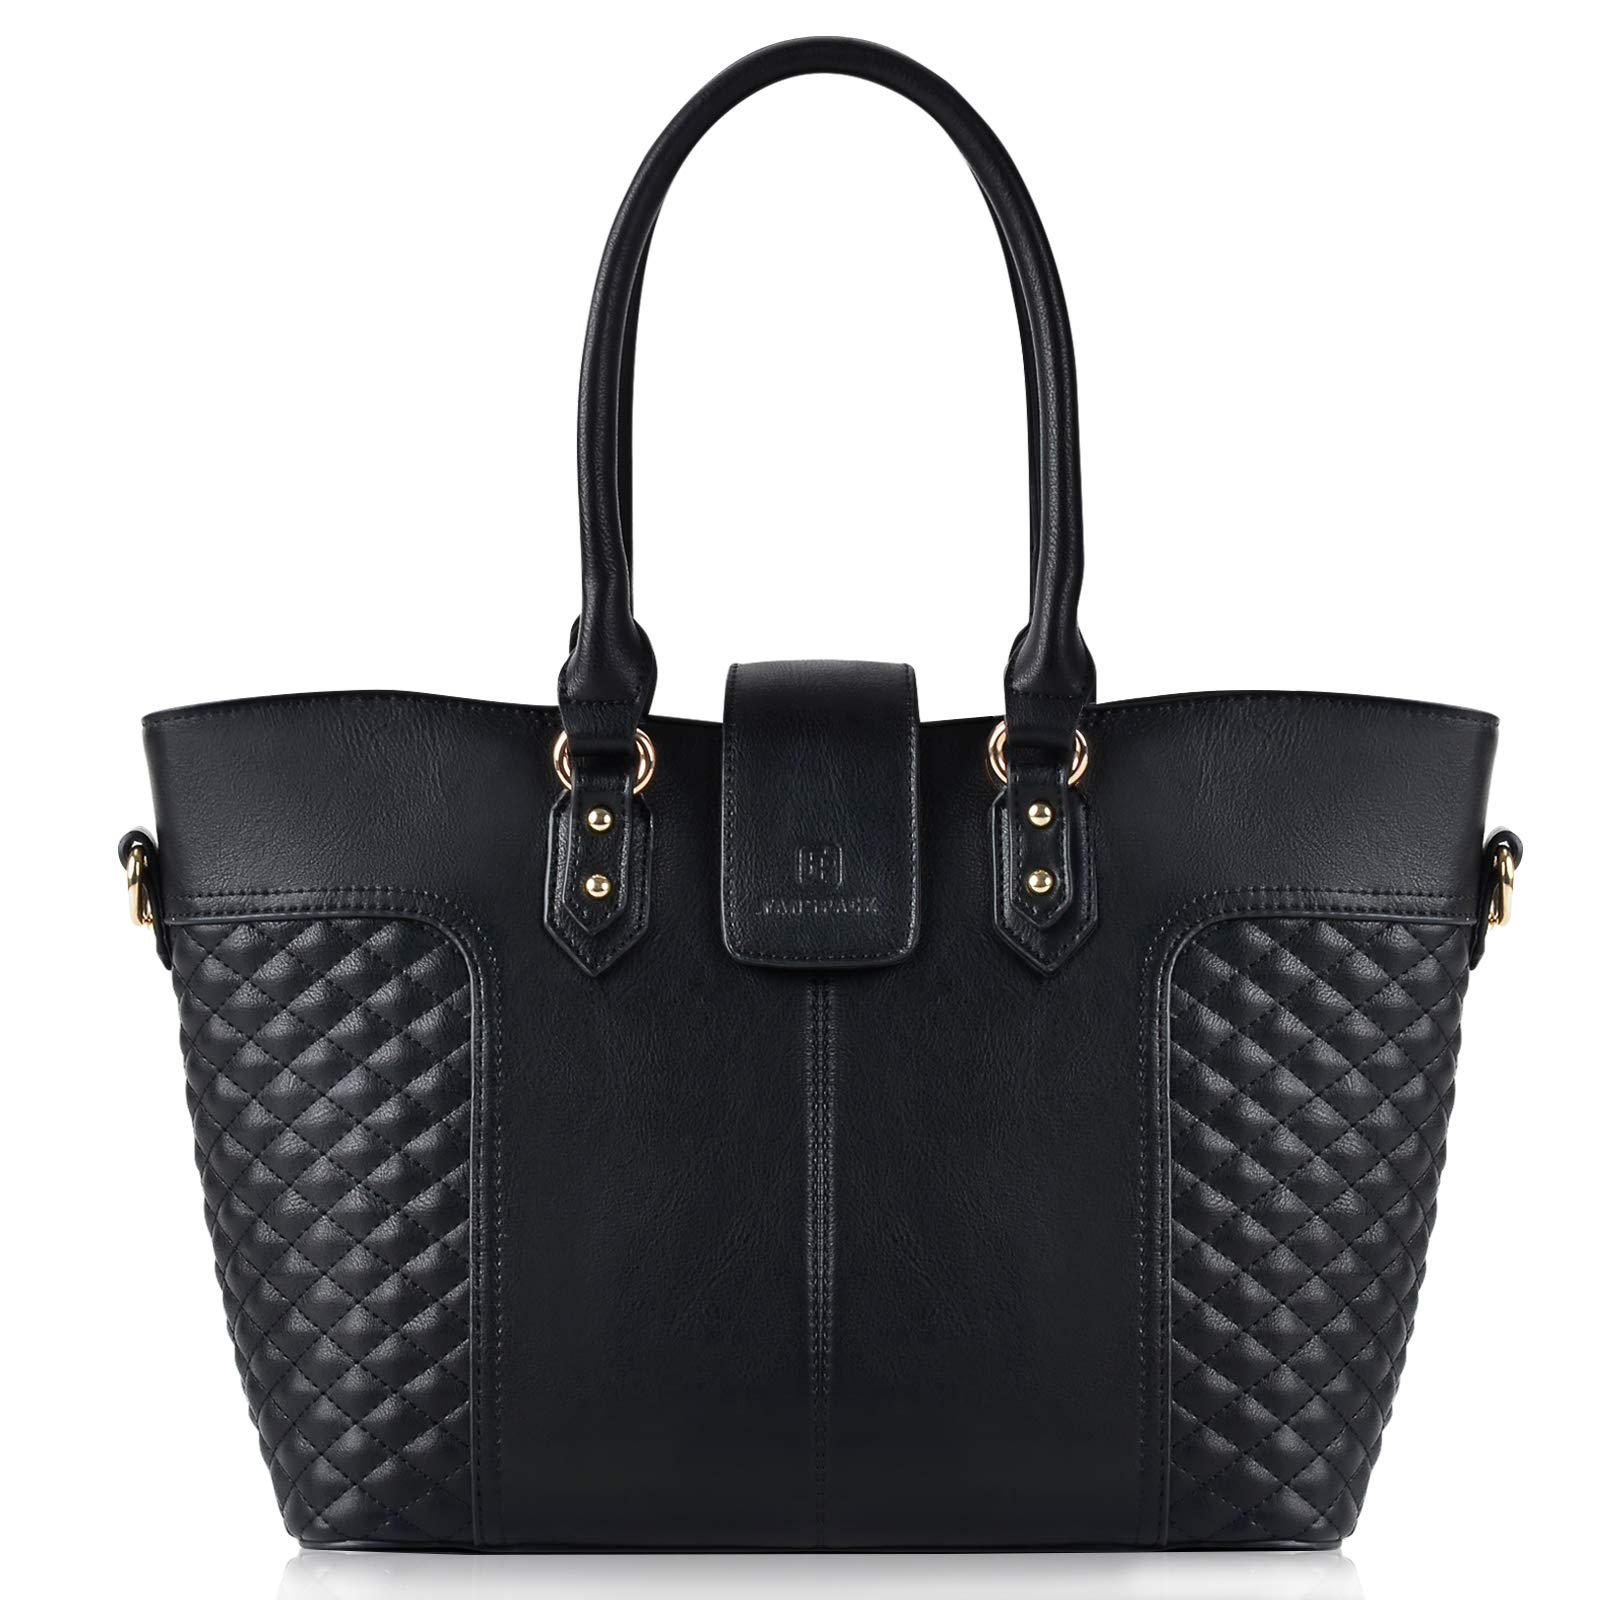 Fanspack Women's PU Leather Tote Bag Lattice Pattern Top Handle Tote Handbags Crossbody Shoulder Bag Purses and Handbags